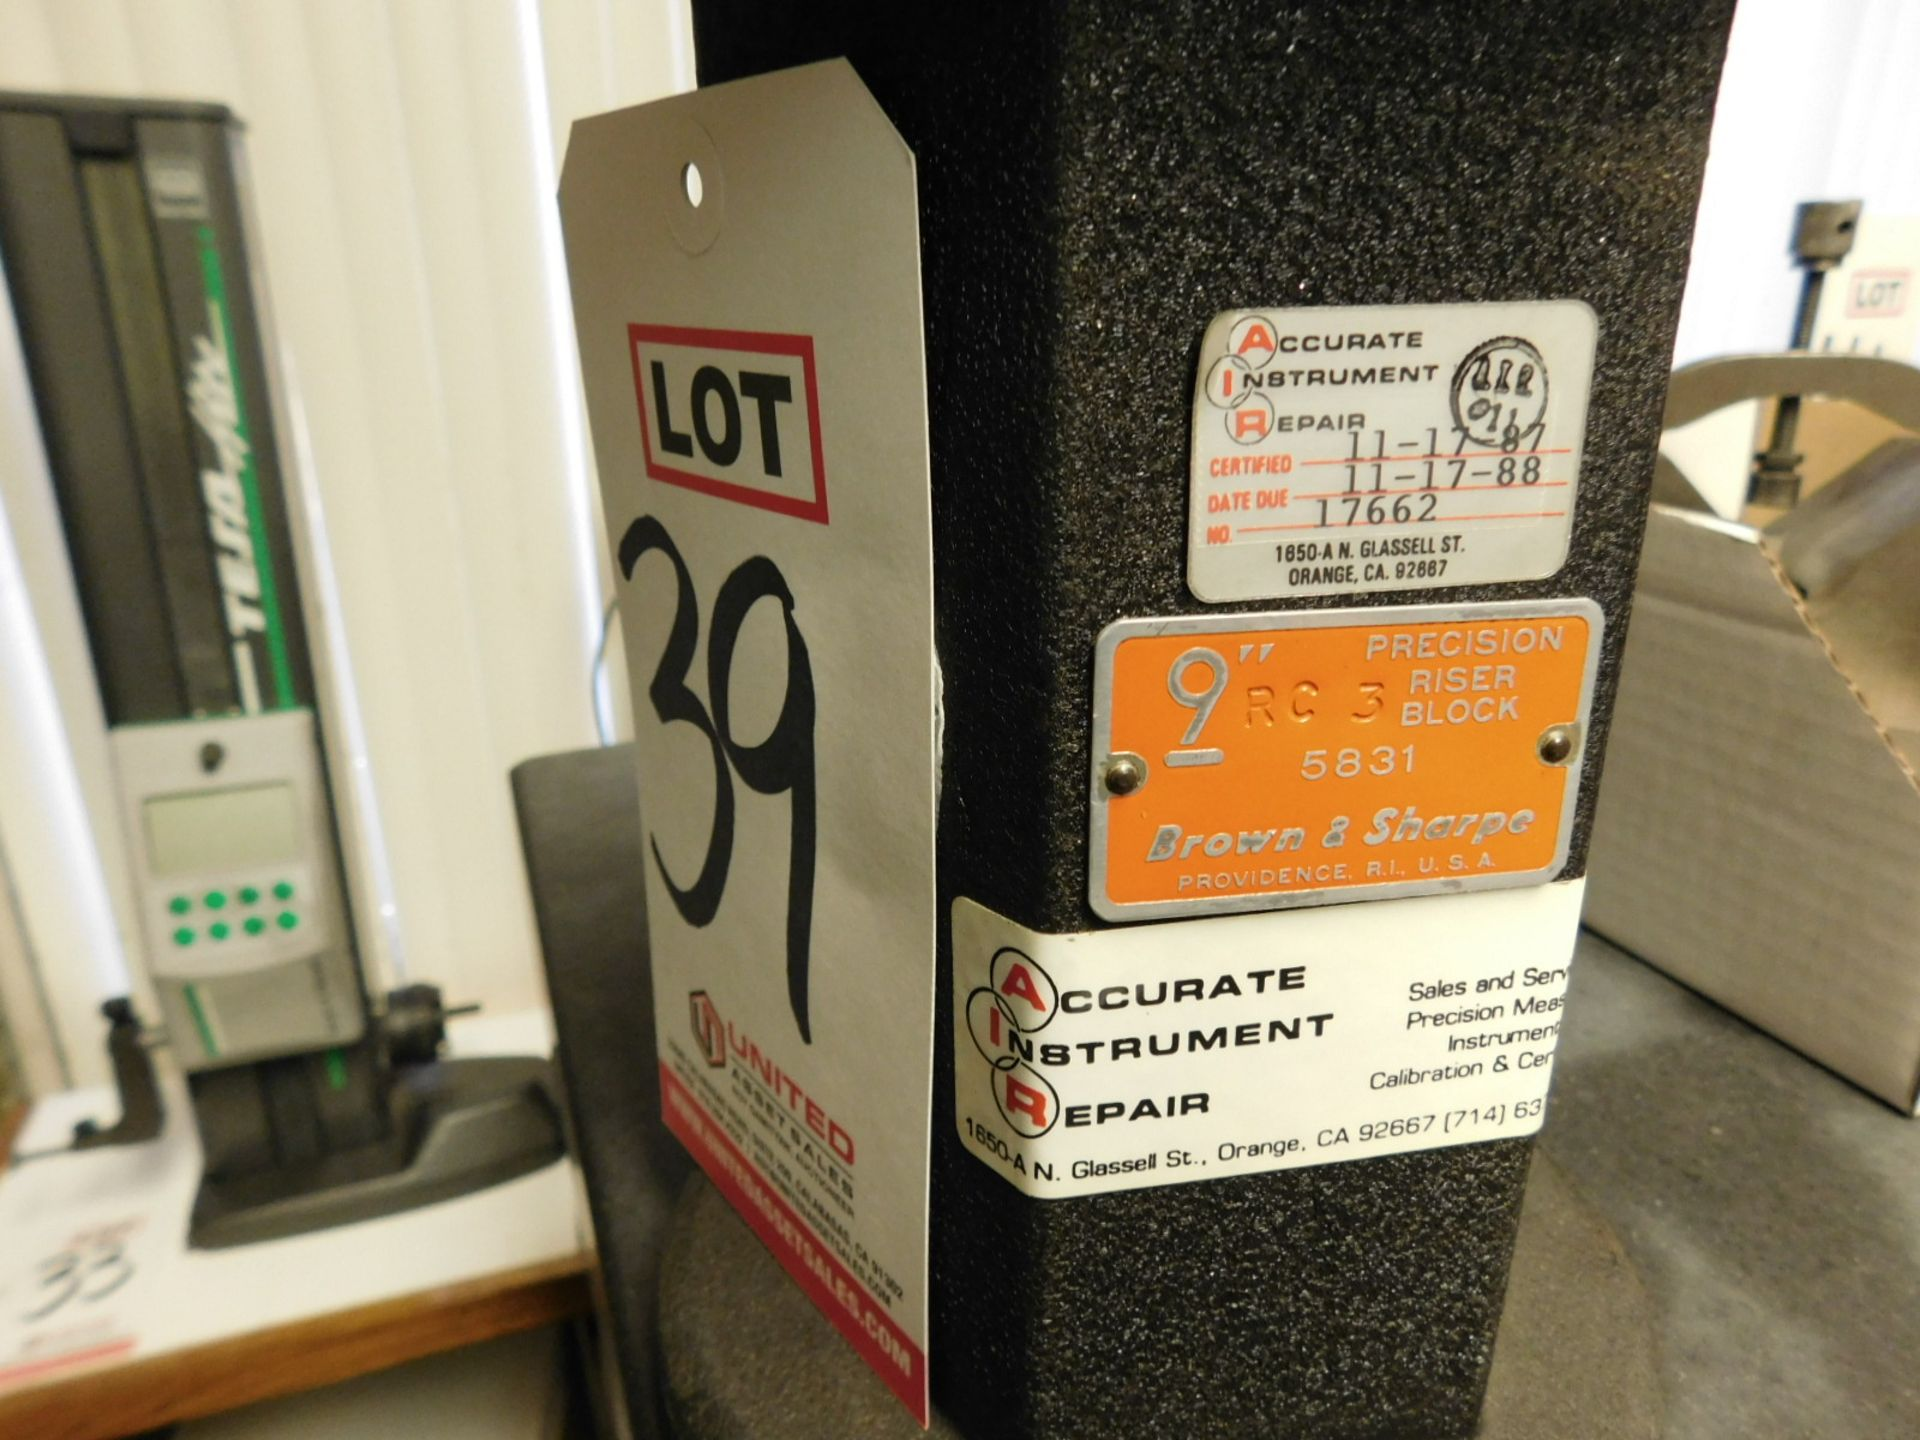 "Lot 39 - BROWN & SHARPE 9"" PRECISION RISER BLOCK, NO. 5831"